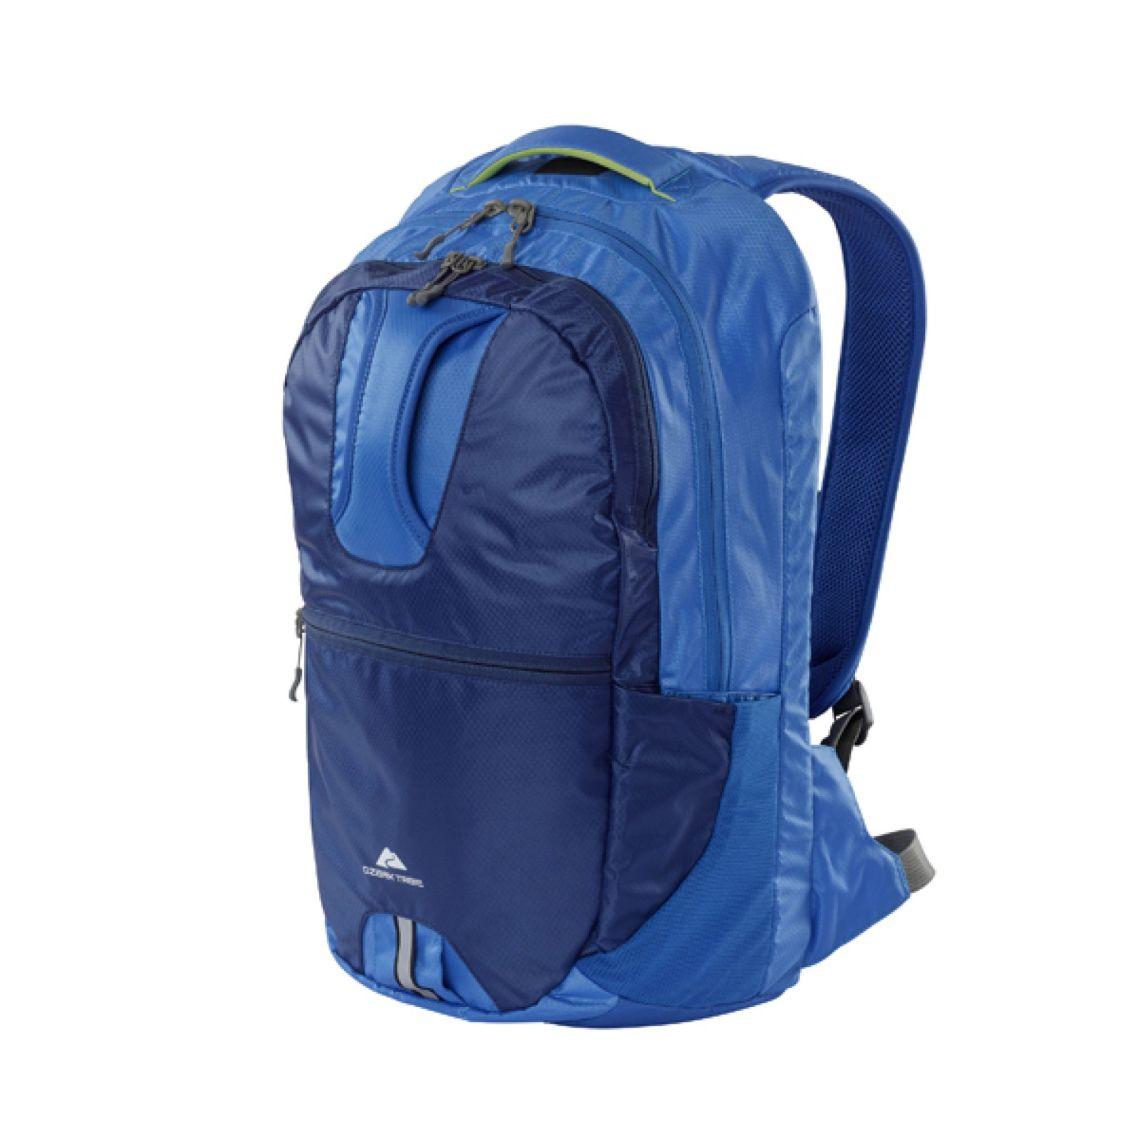 Ozark Trail Ridgecrest Backpack - Walmart.com